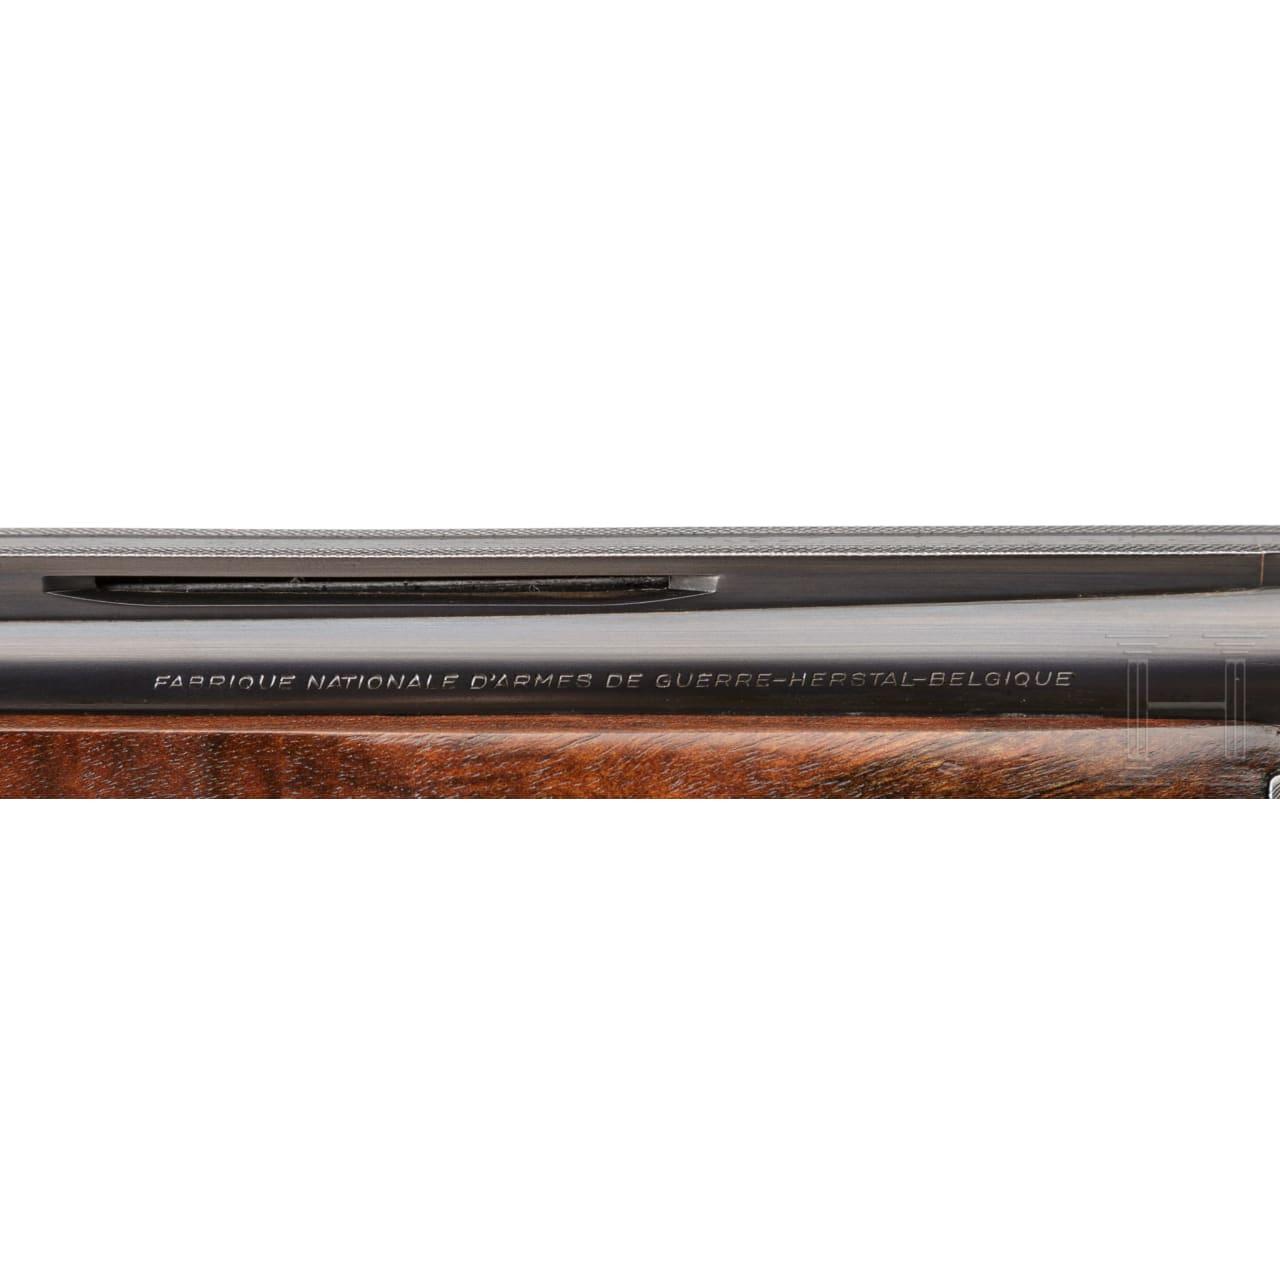 Bockdoppelflinte FN Browning B25, Mod. Spezial-Jagd/D 4, Luxusausführung im Lederkoffer